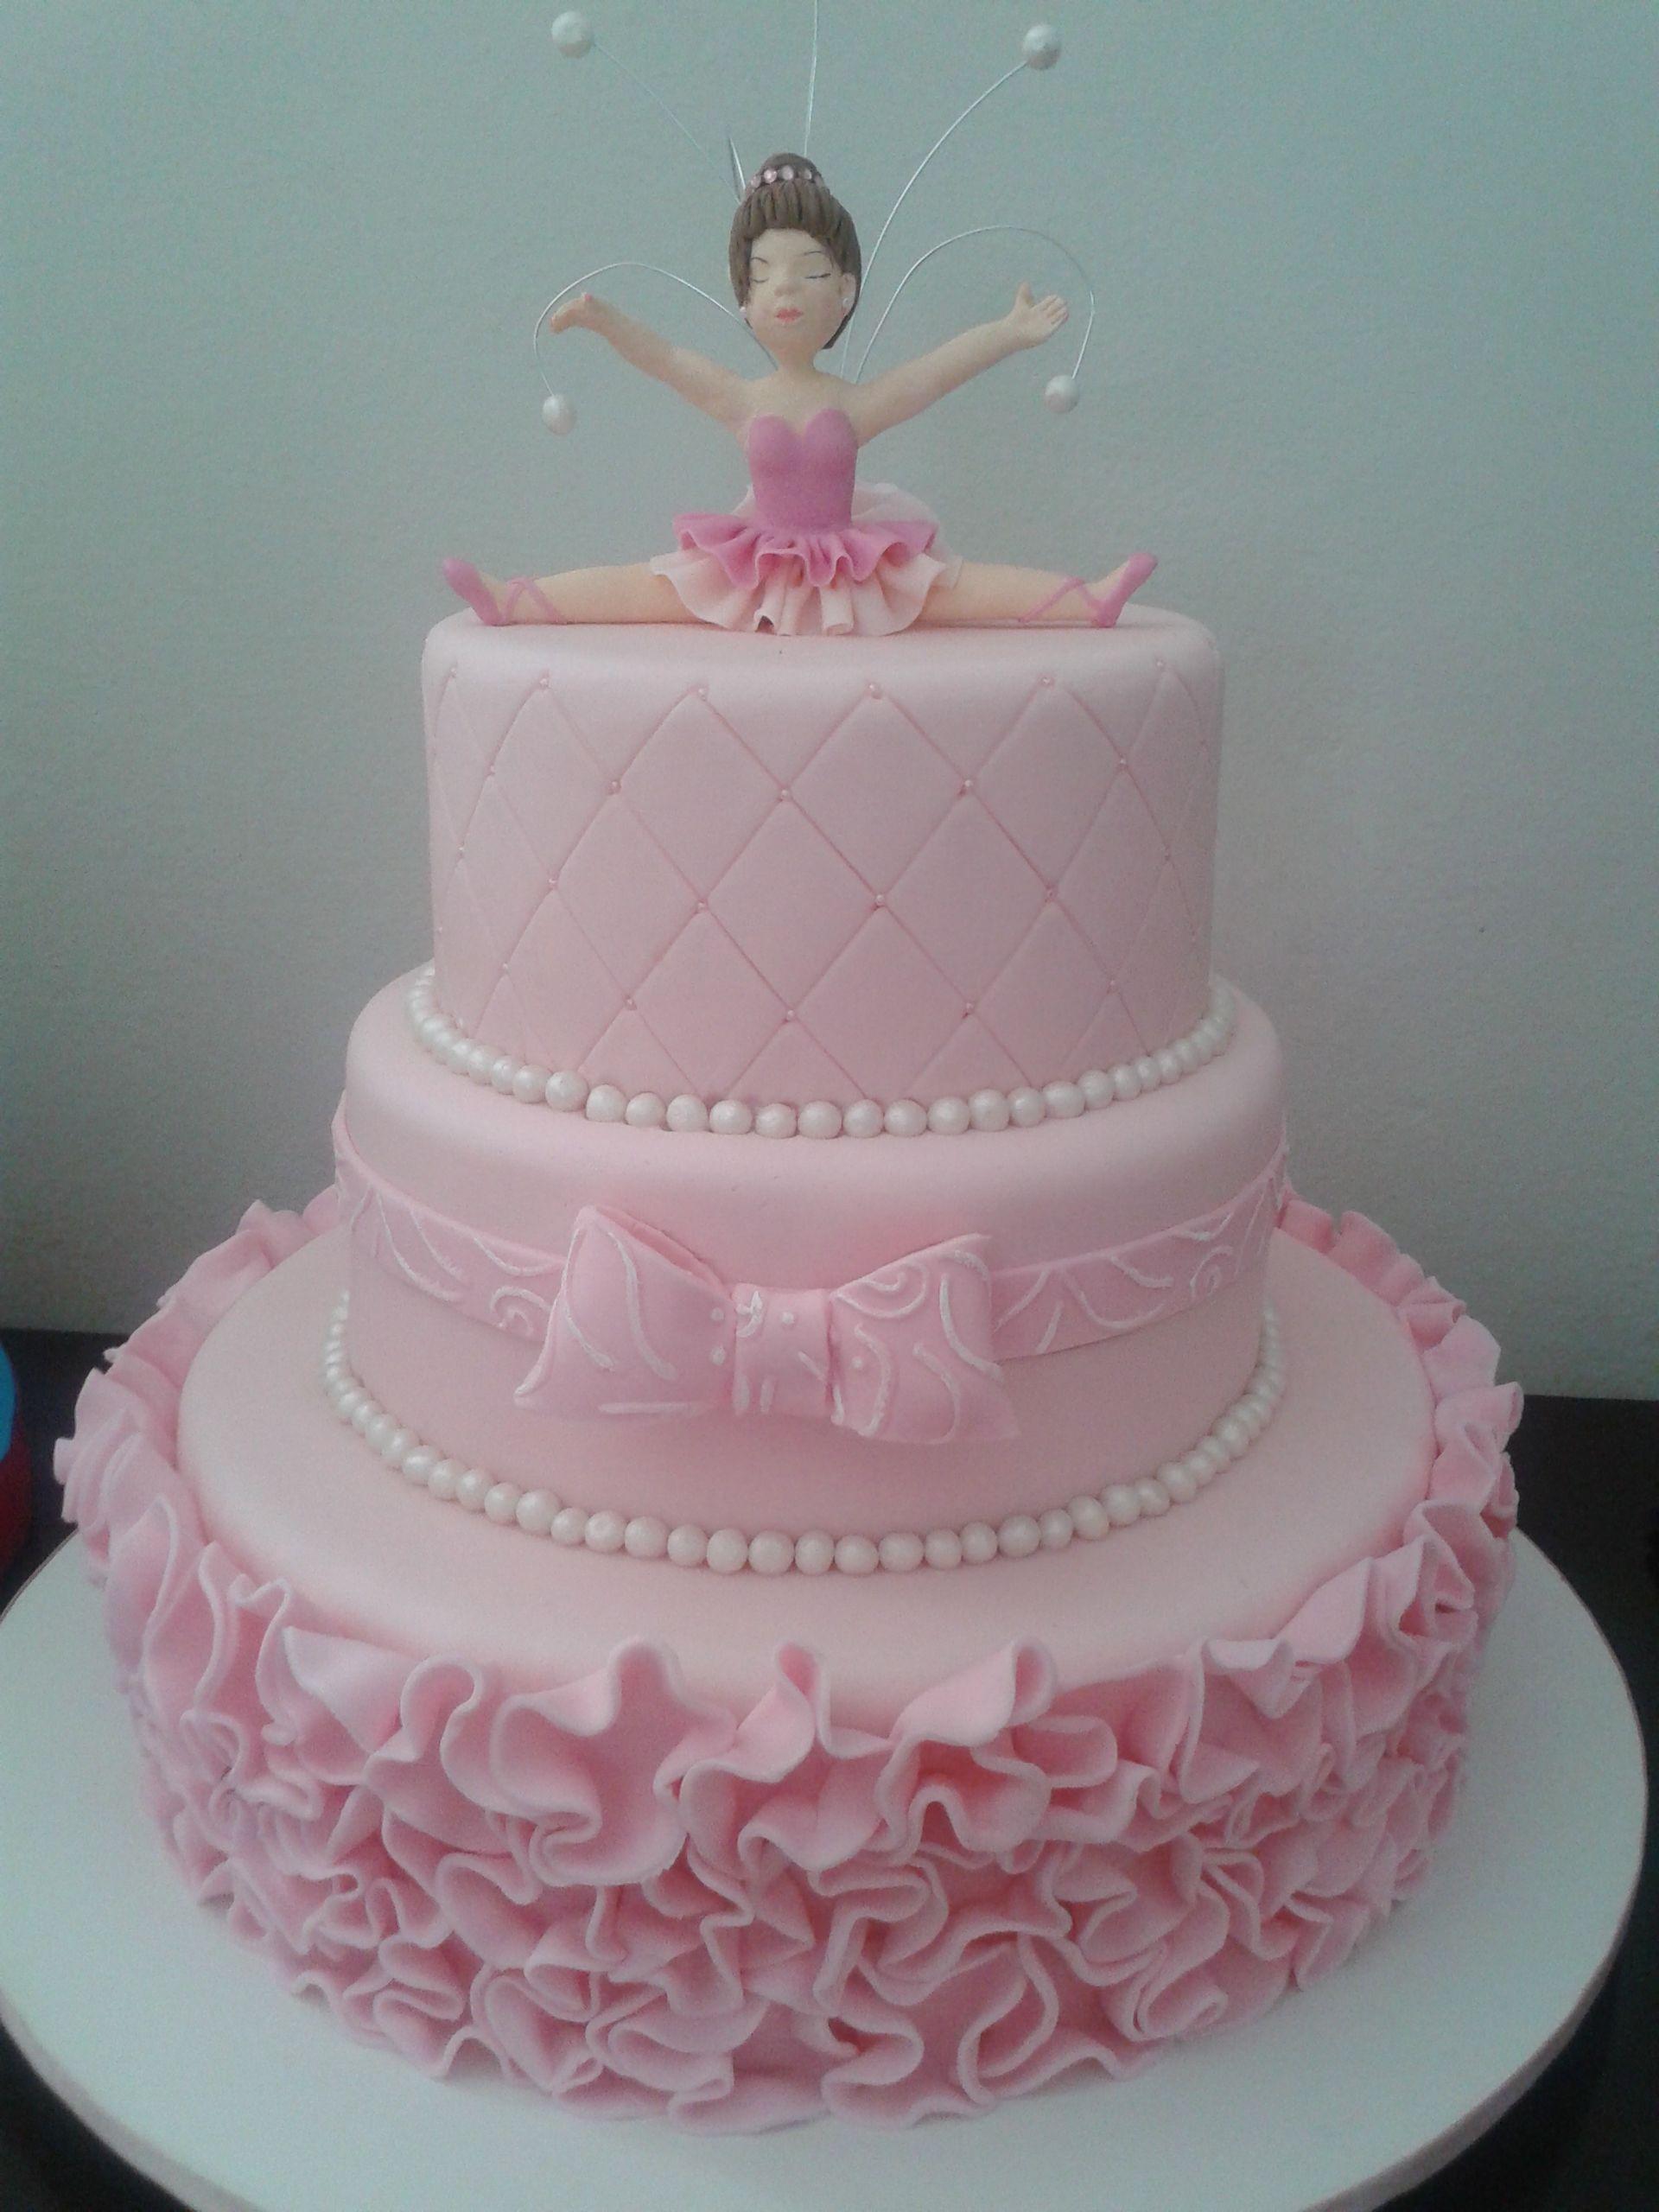 bolo de bailarina cake figures pinterest cake ballerina and birthday cakes. Black Bedroom Furniture Sets. Home Design Ideas